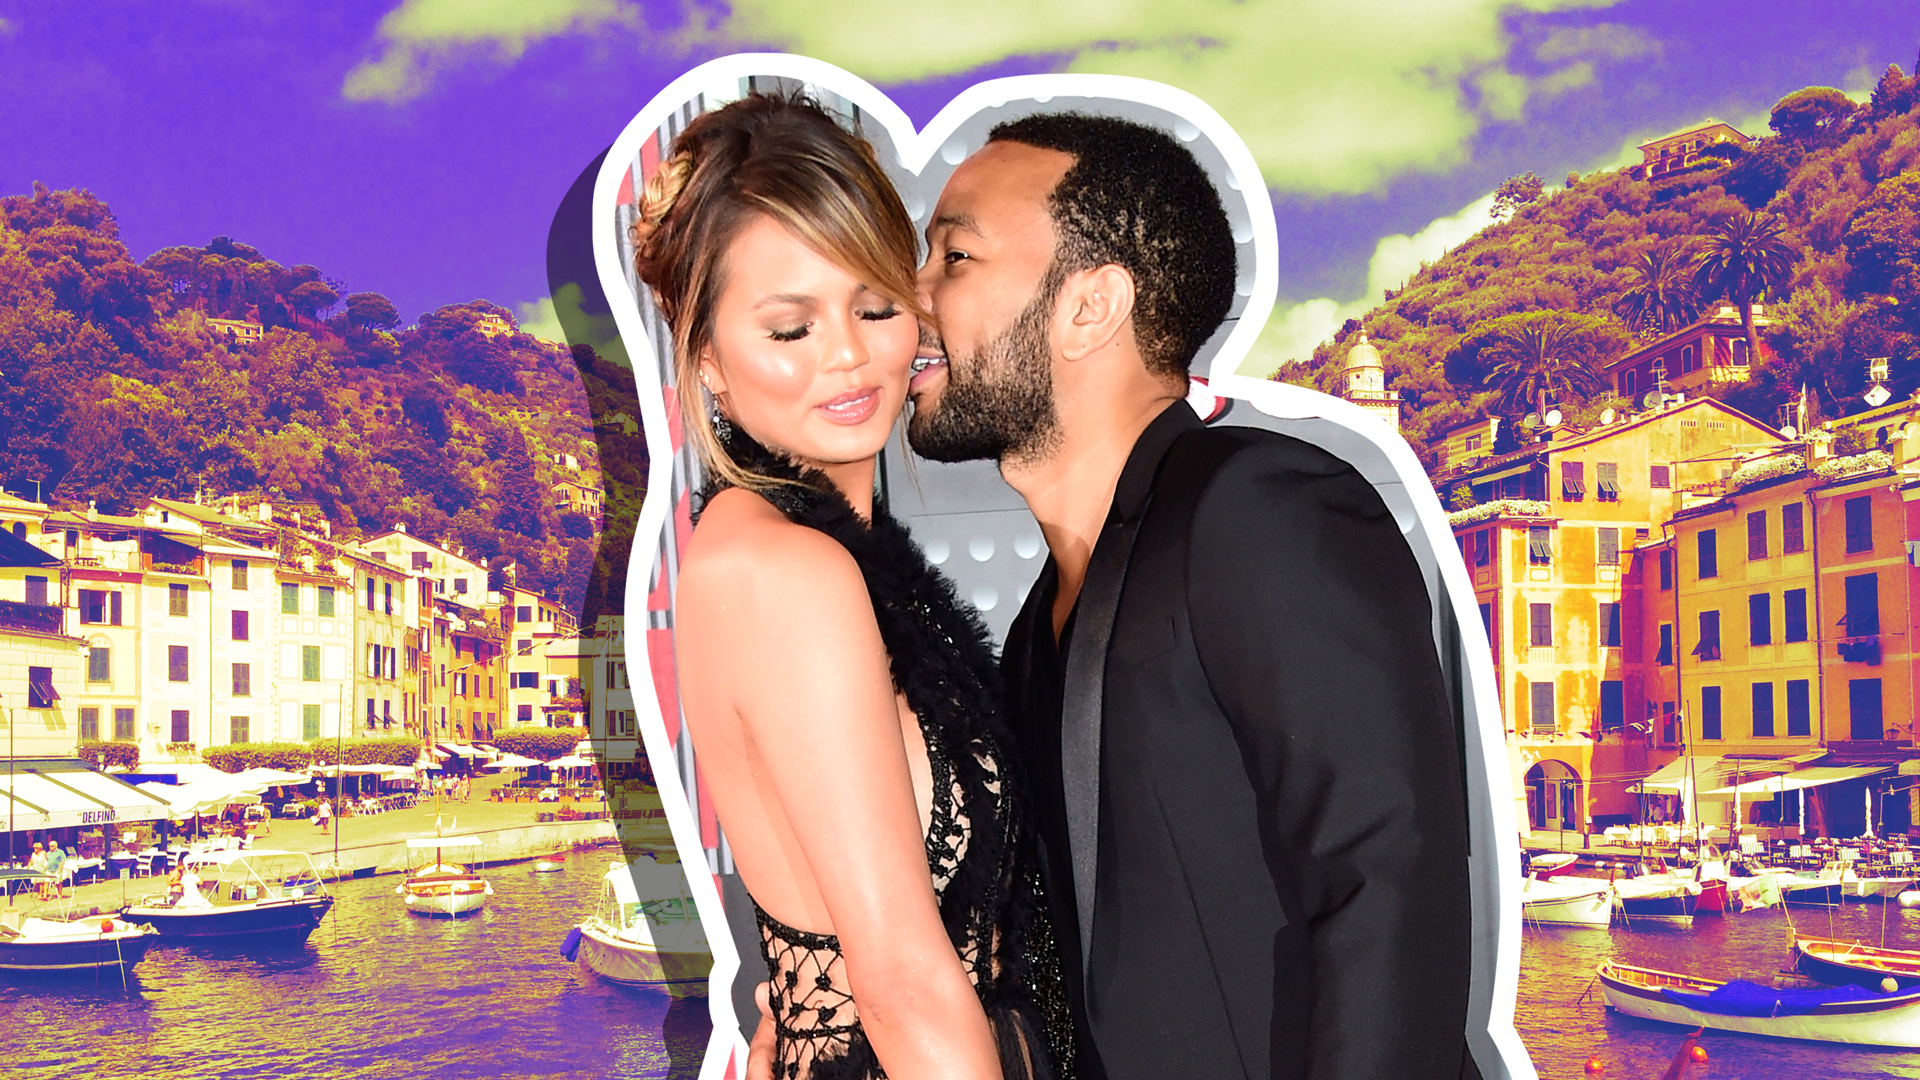 10 Romantic Celebrity Honeymoon Destinations to Swoon Over